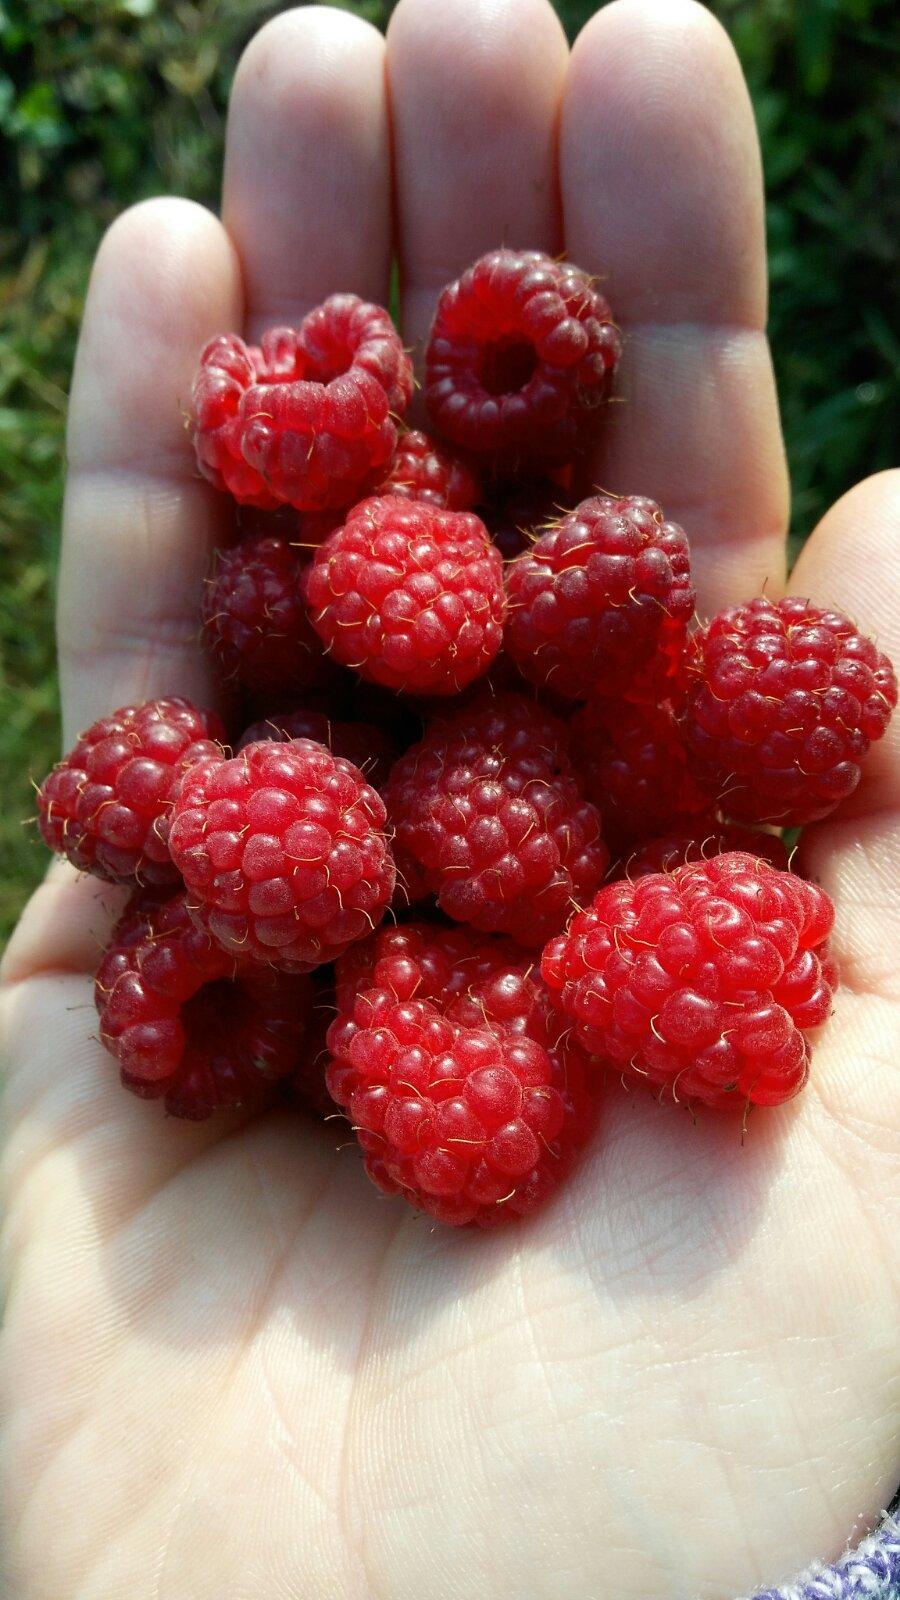 Открытка, картинки ягода малина нас к себе манила